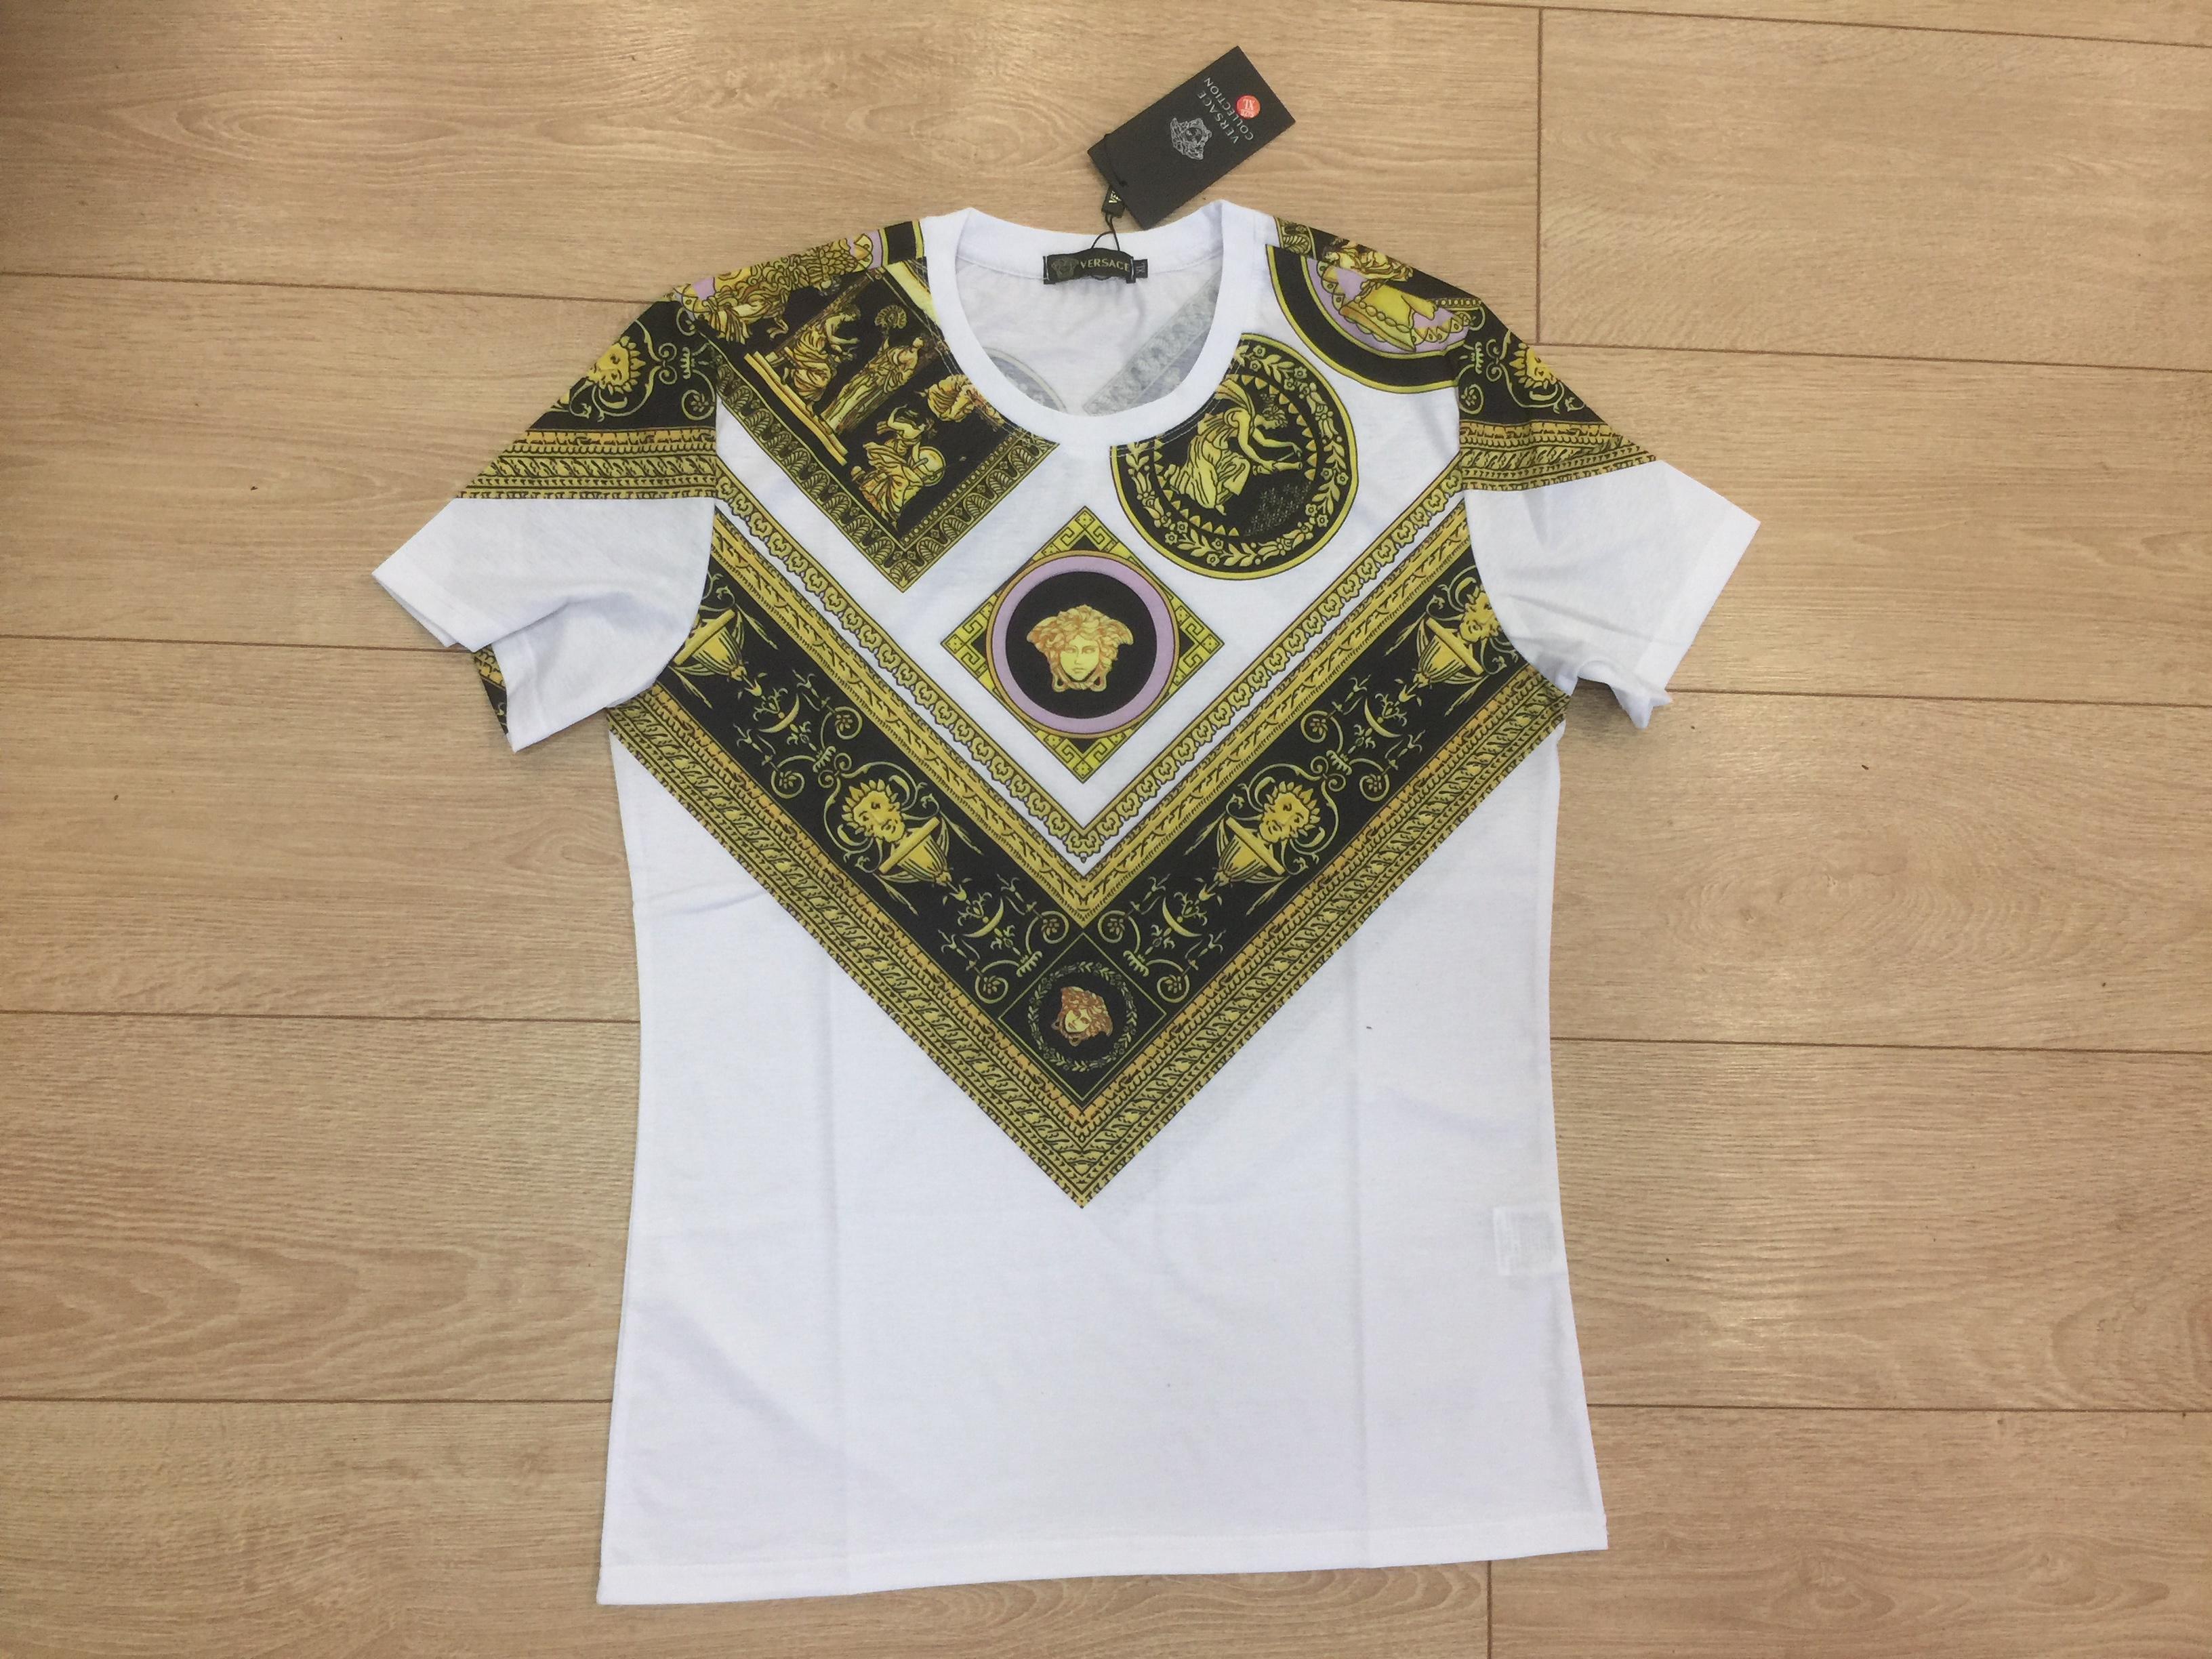 фото футболки Версаче на полу